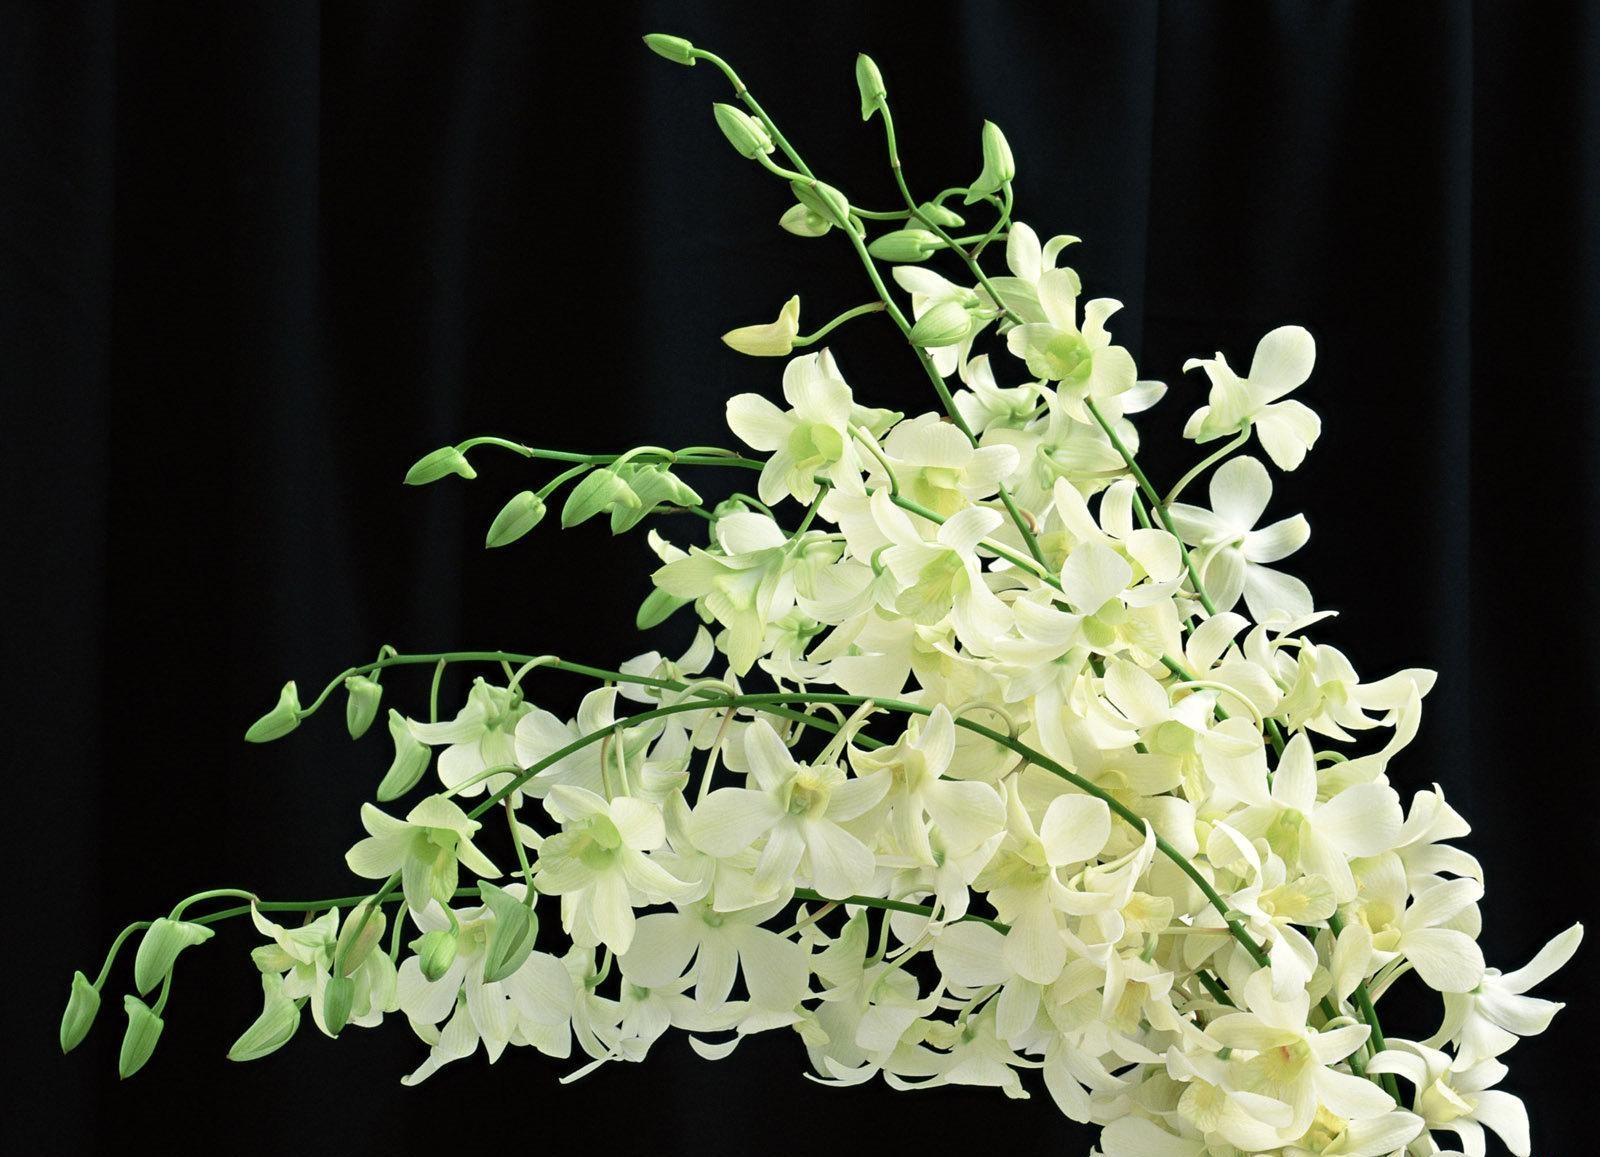 Papel De Parede Branco Fundo Preto Flores Ramo Verde